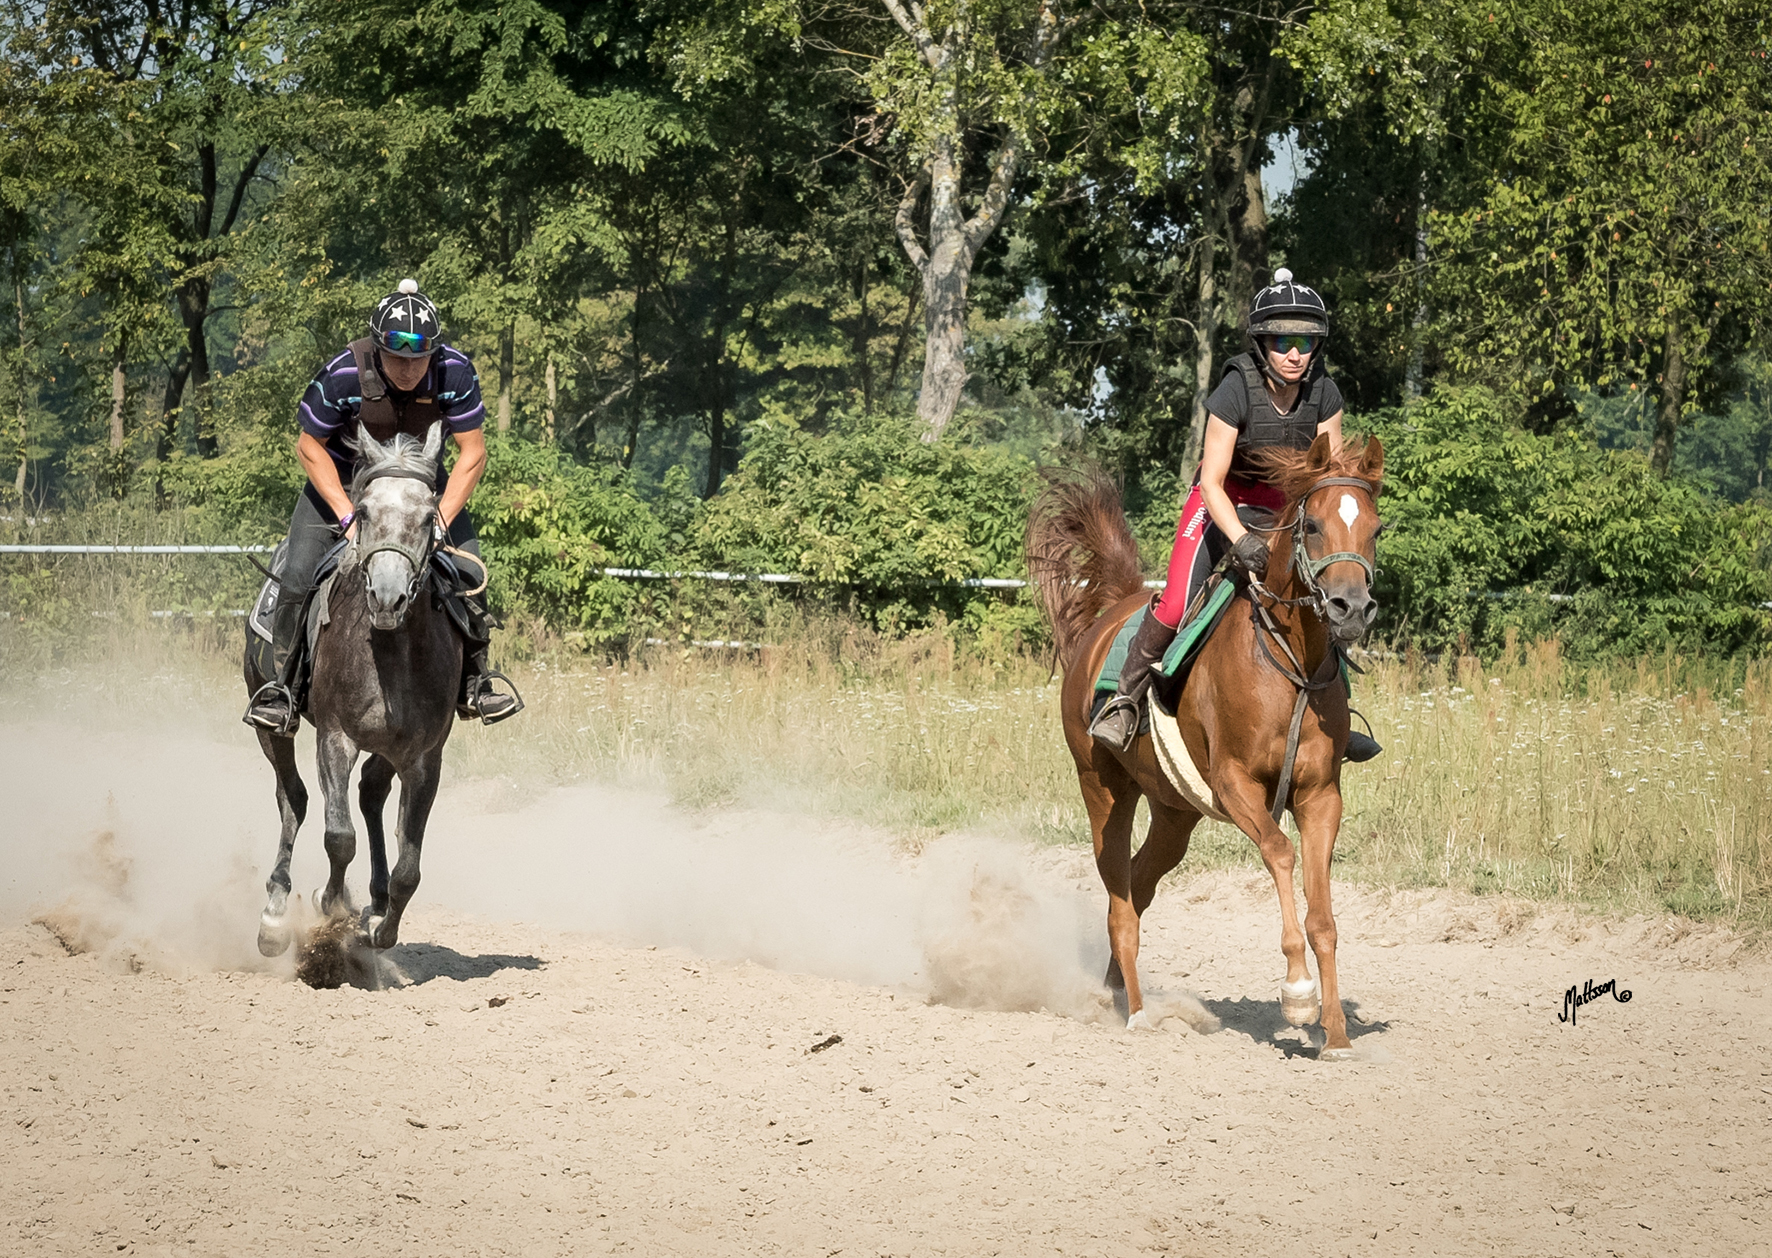 Anawera (Piaff x Altamira) and Patria (Eden C x Palmeta) are getting ready for the Al Khalediah European Arabian Horse Festial